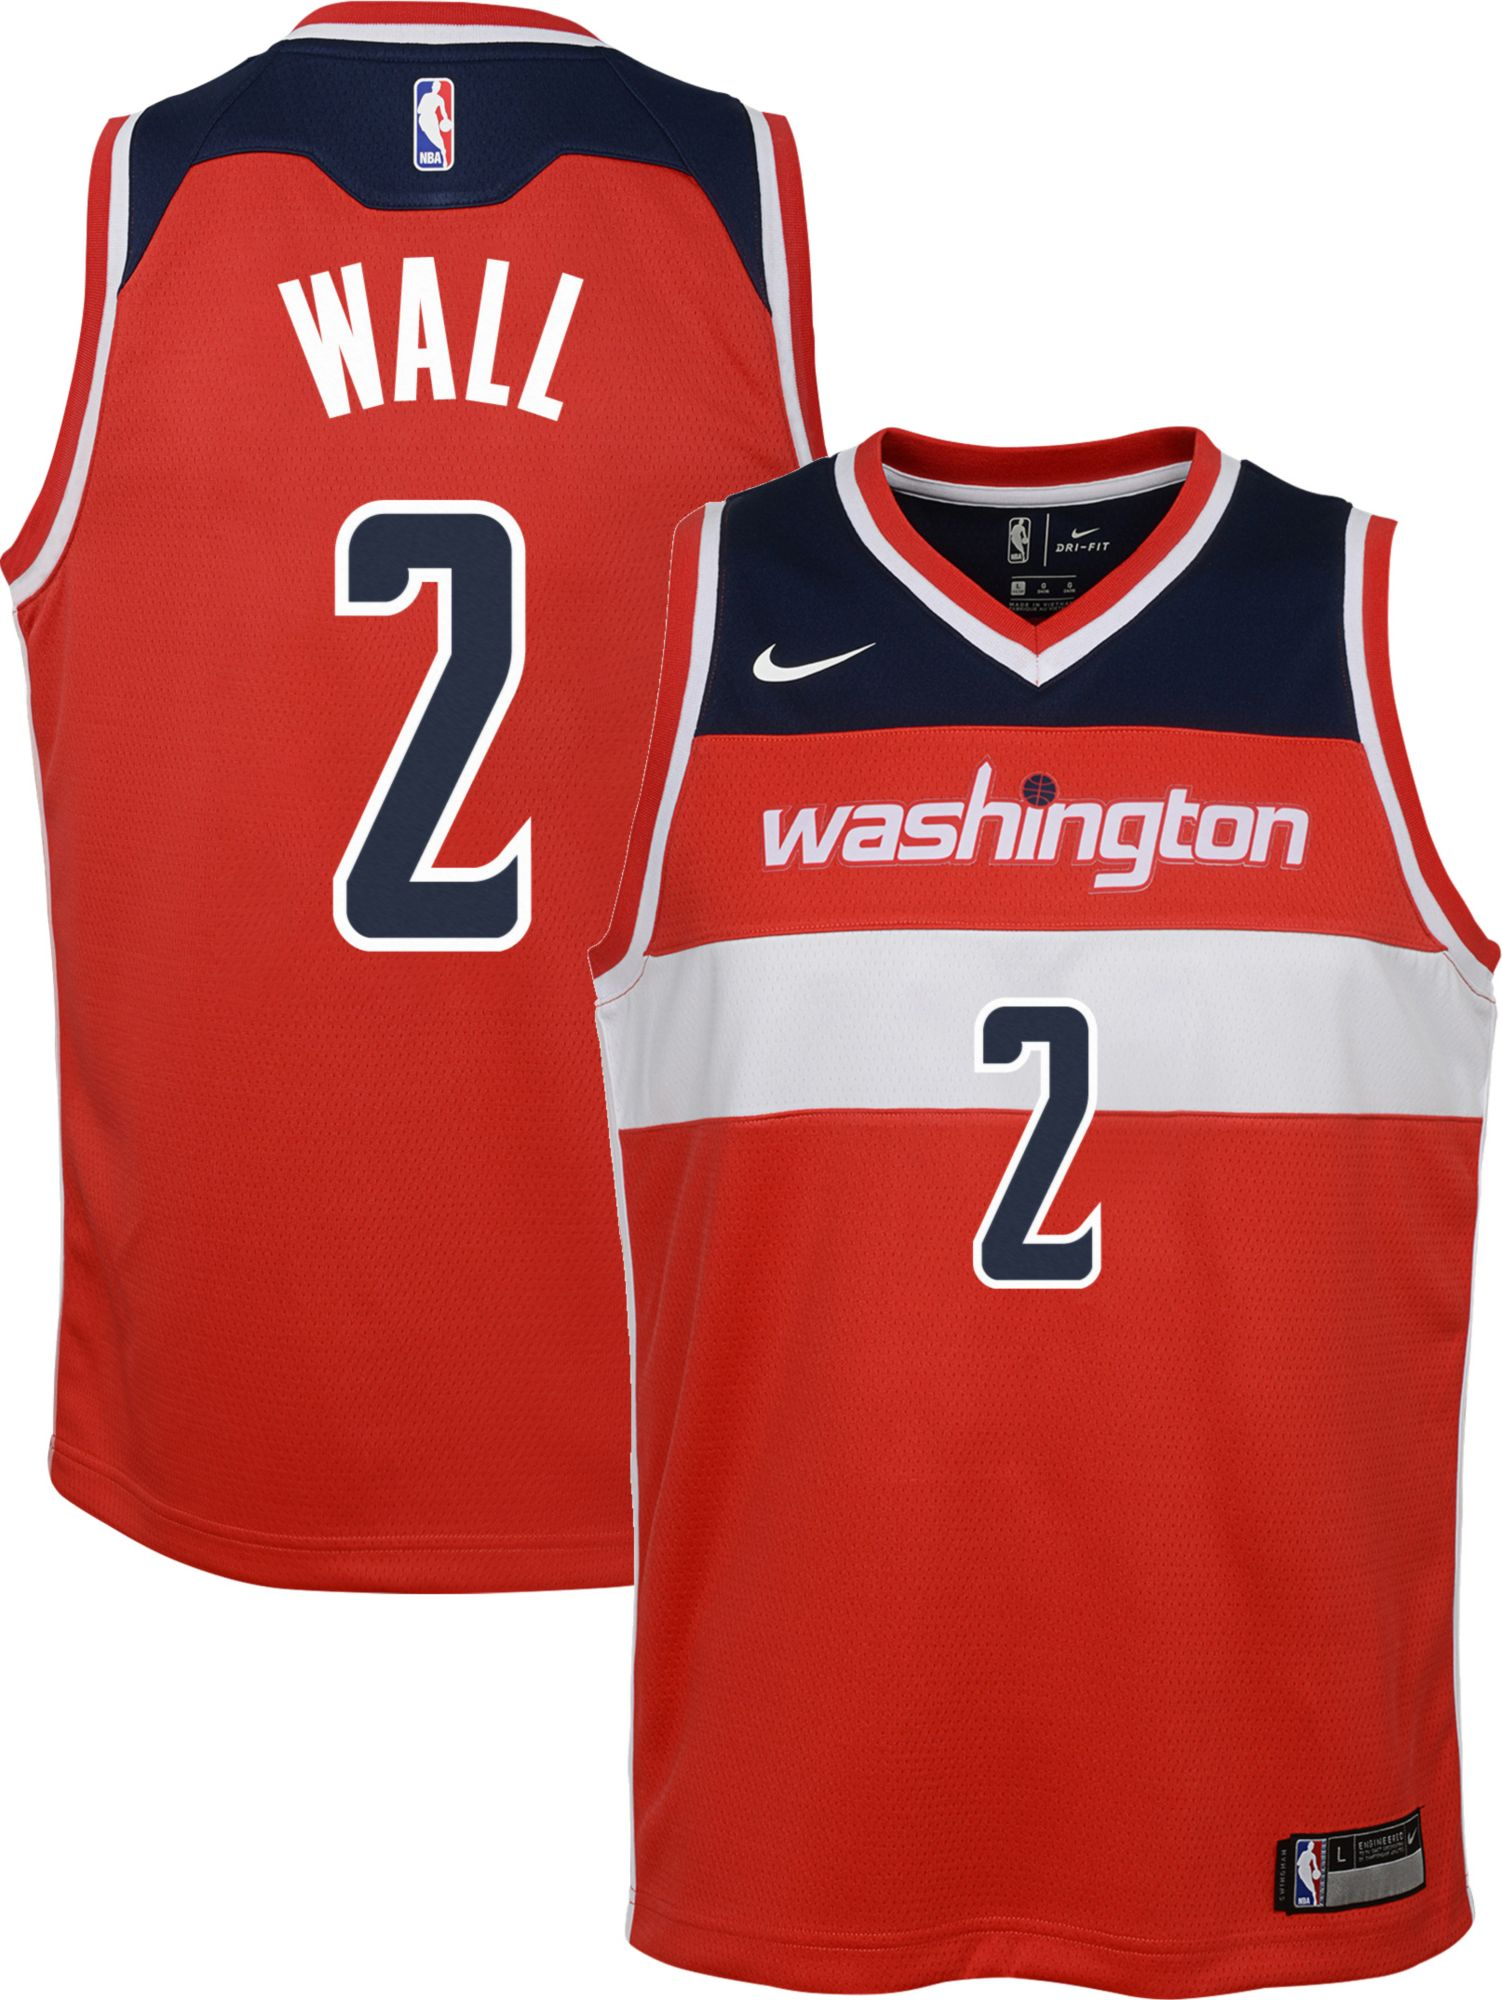 timeless design f4474 5e124 washington wizards john wall jersey